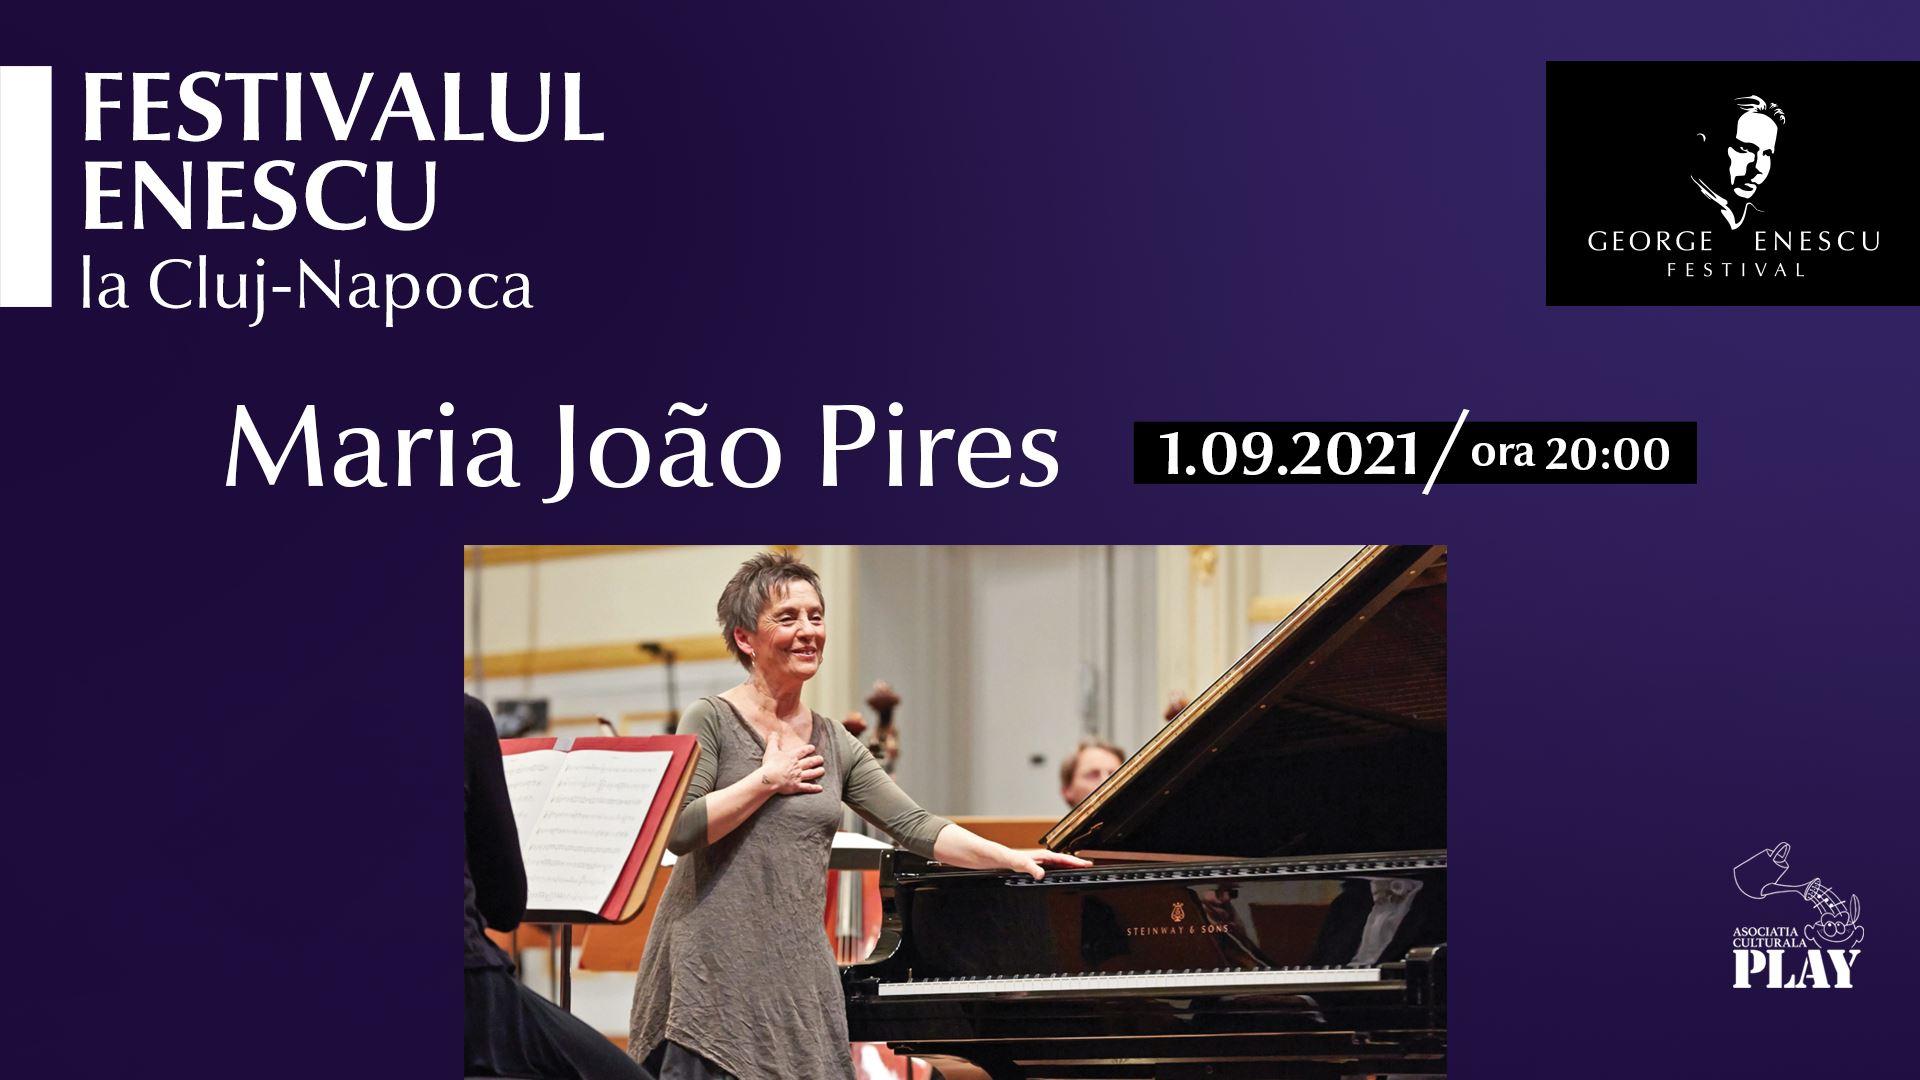 Recital Maria João Pires Festivalul Enescu la Cluj-Napoca